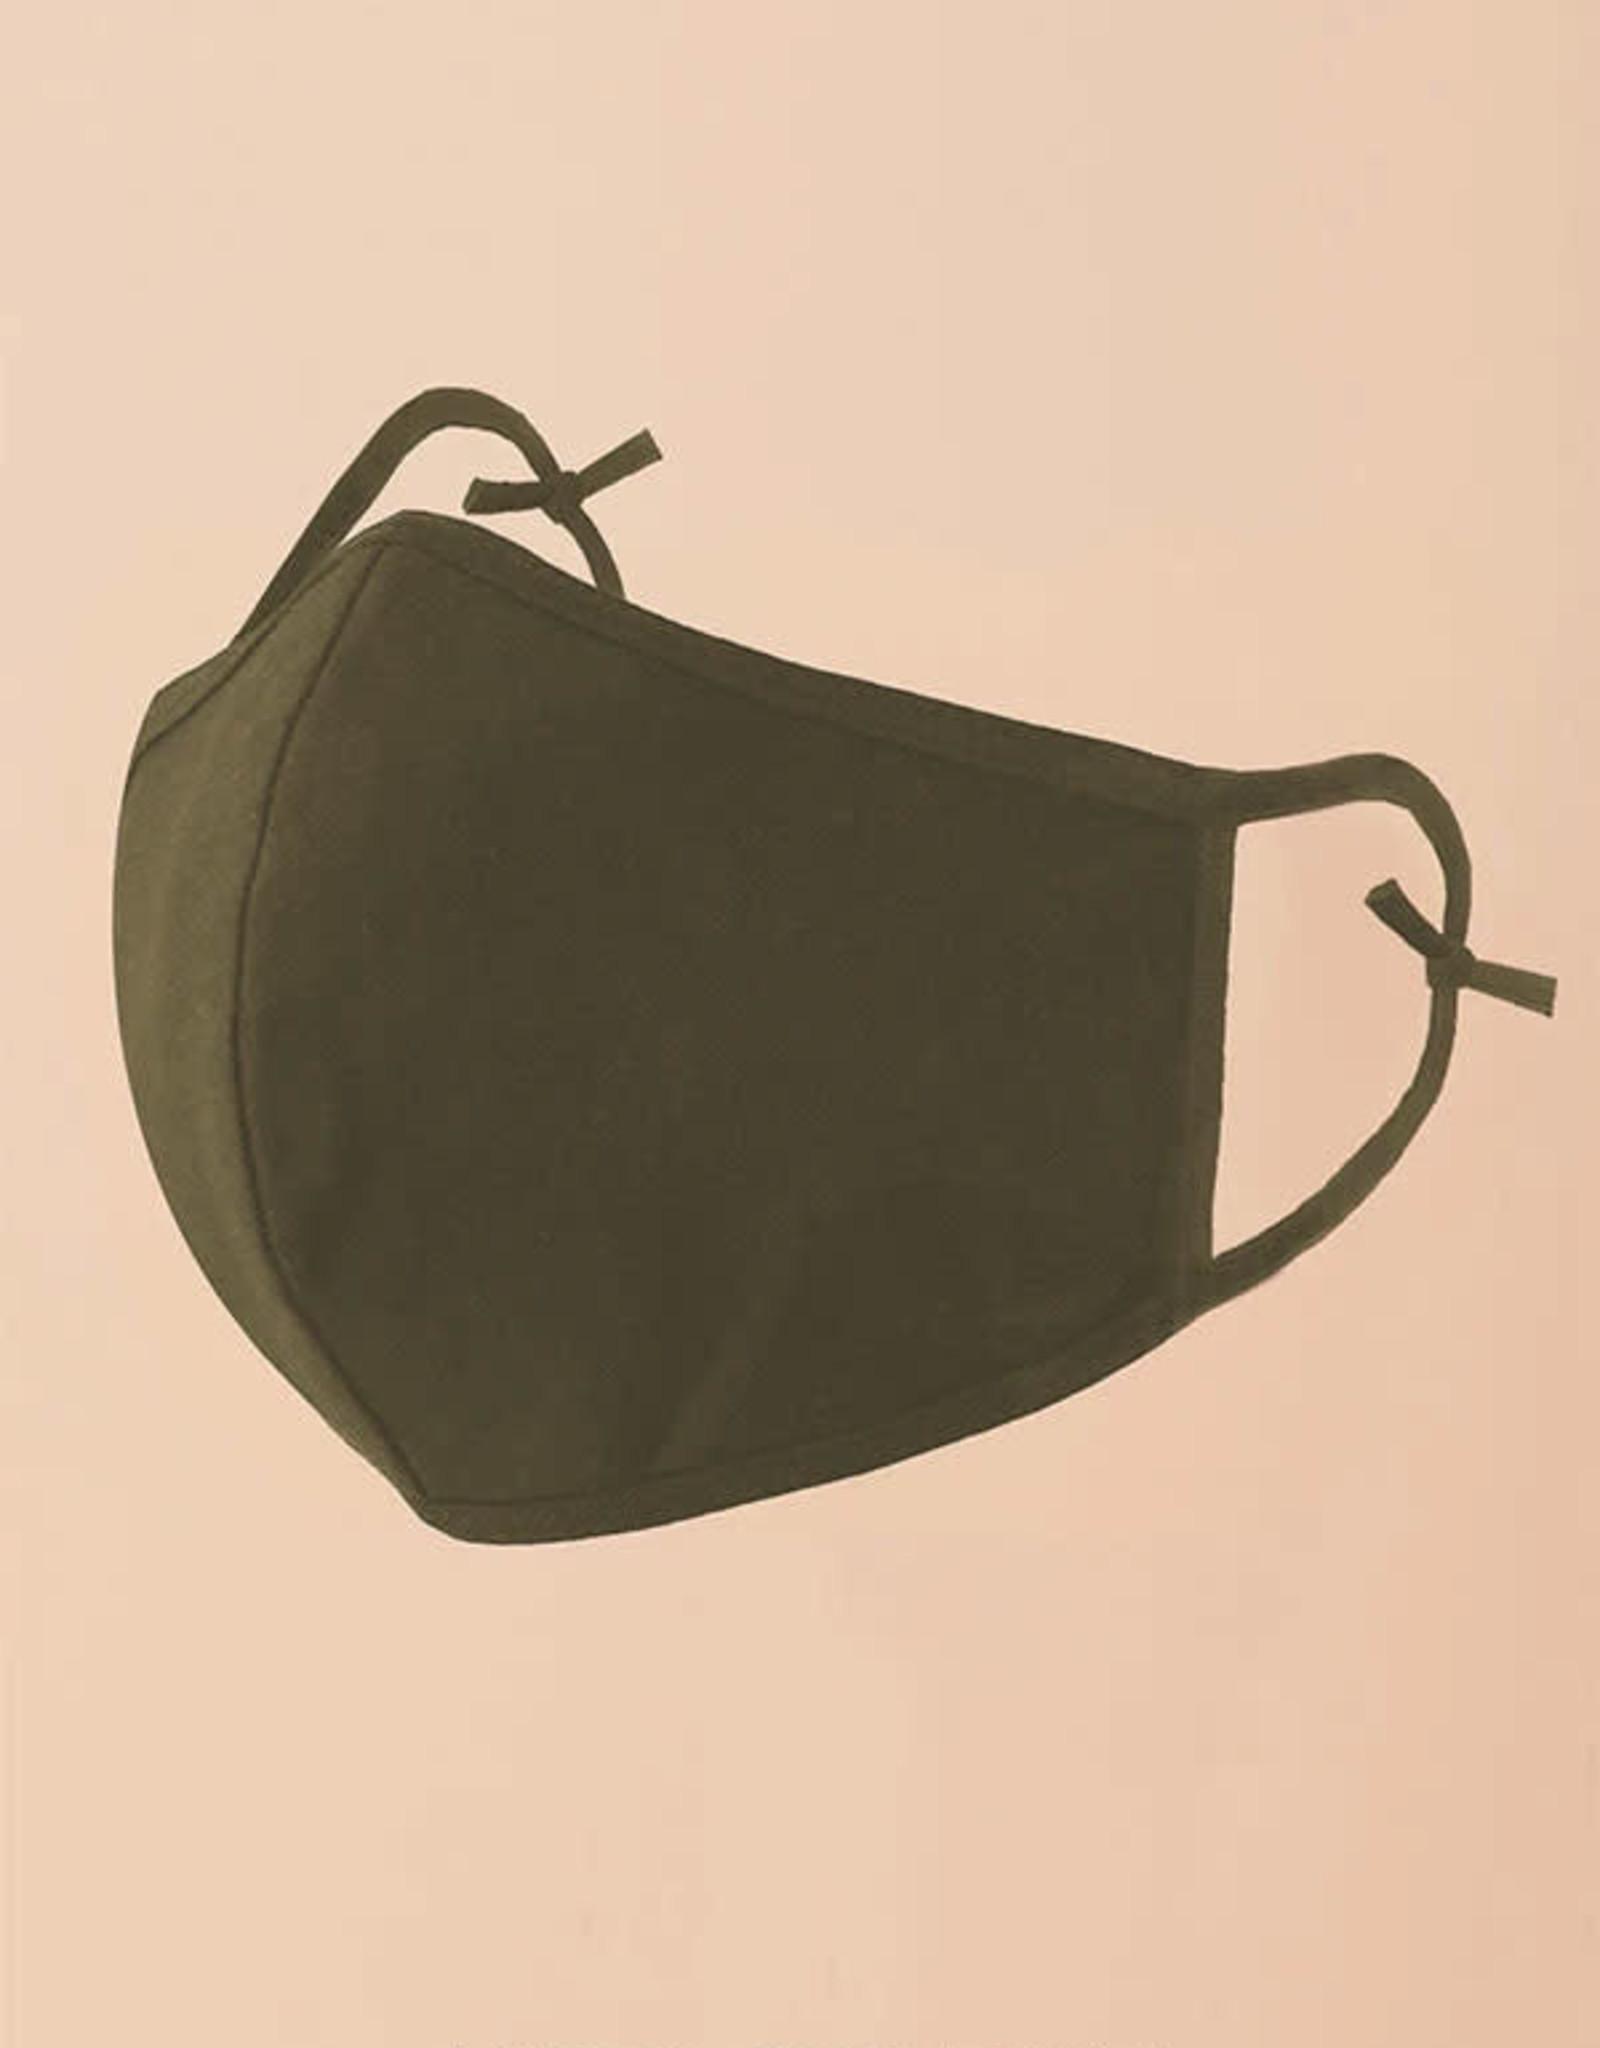 HYFVE 2-Layer Cotton Mask